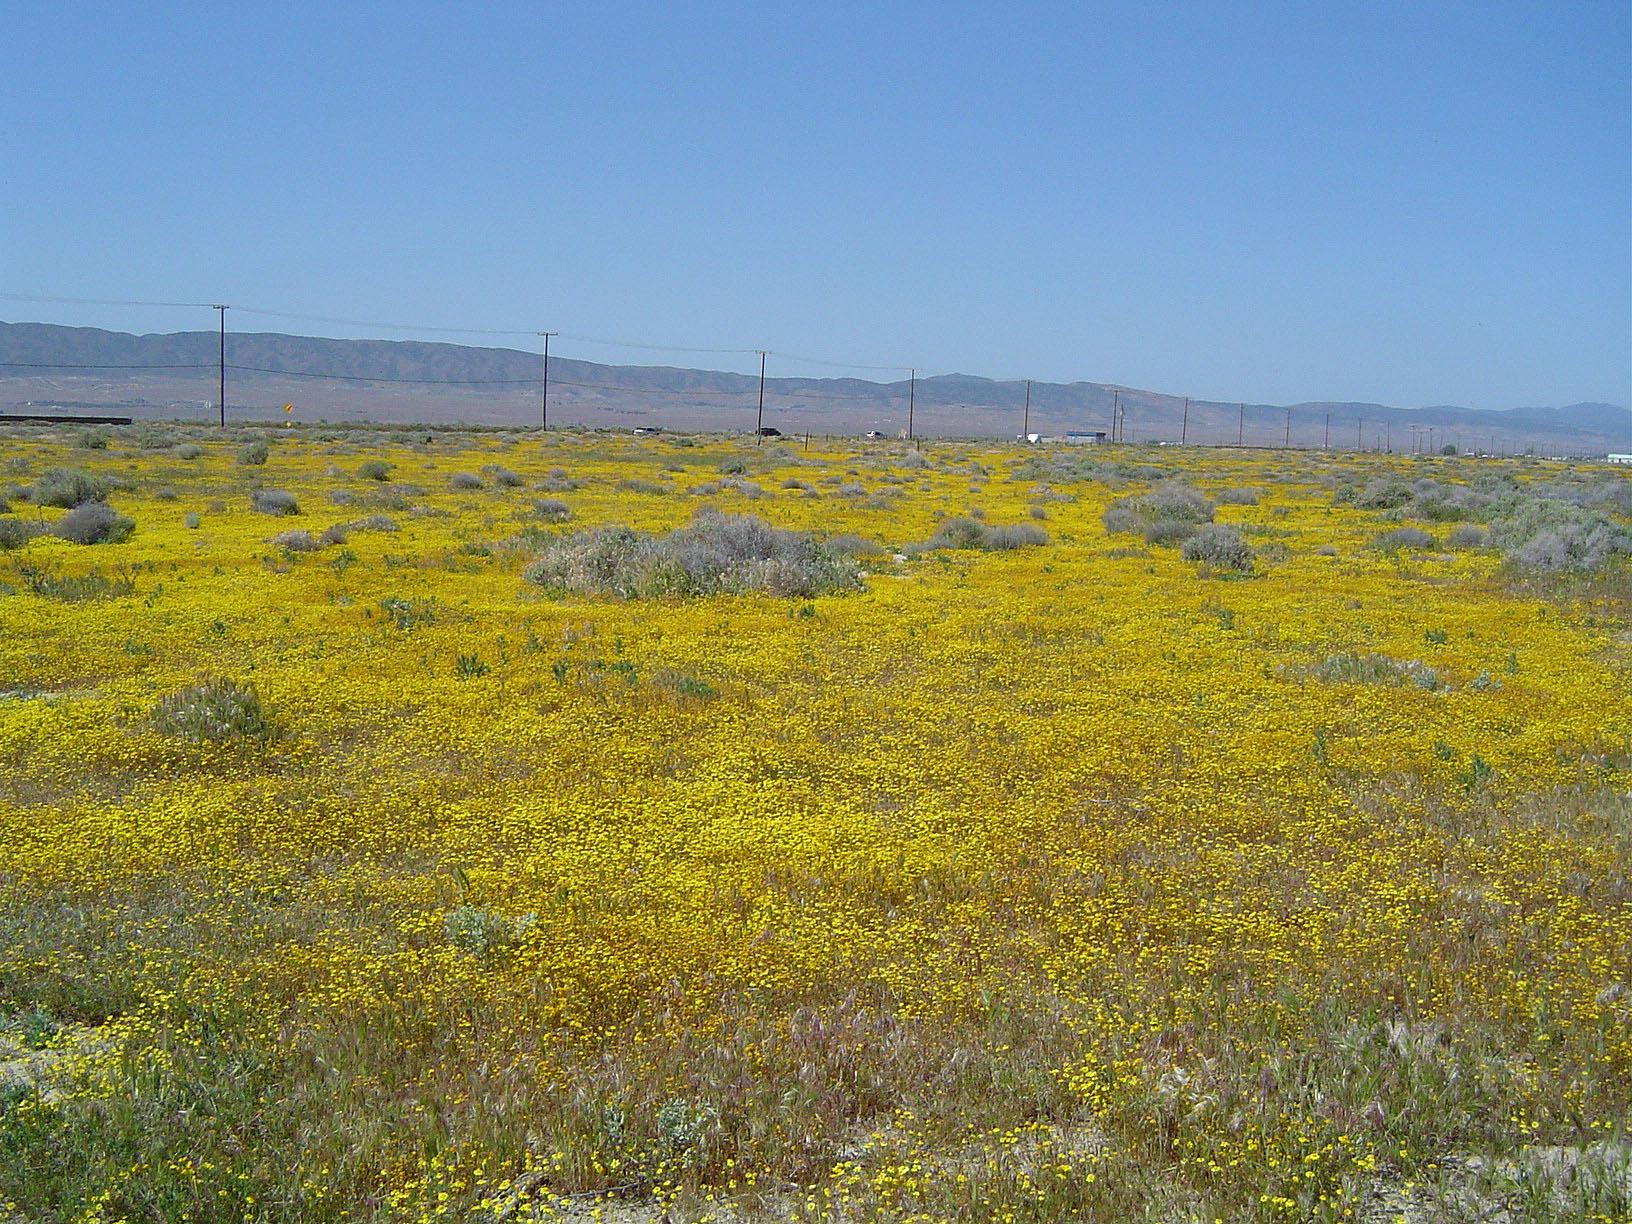 Christian singles groups antelope valley